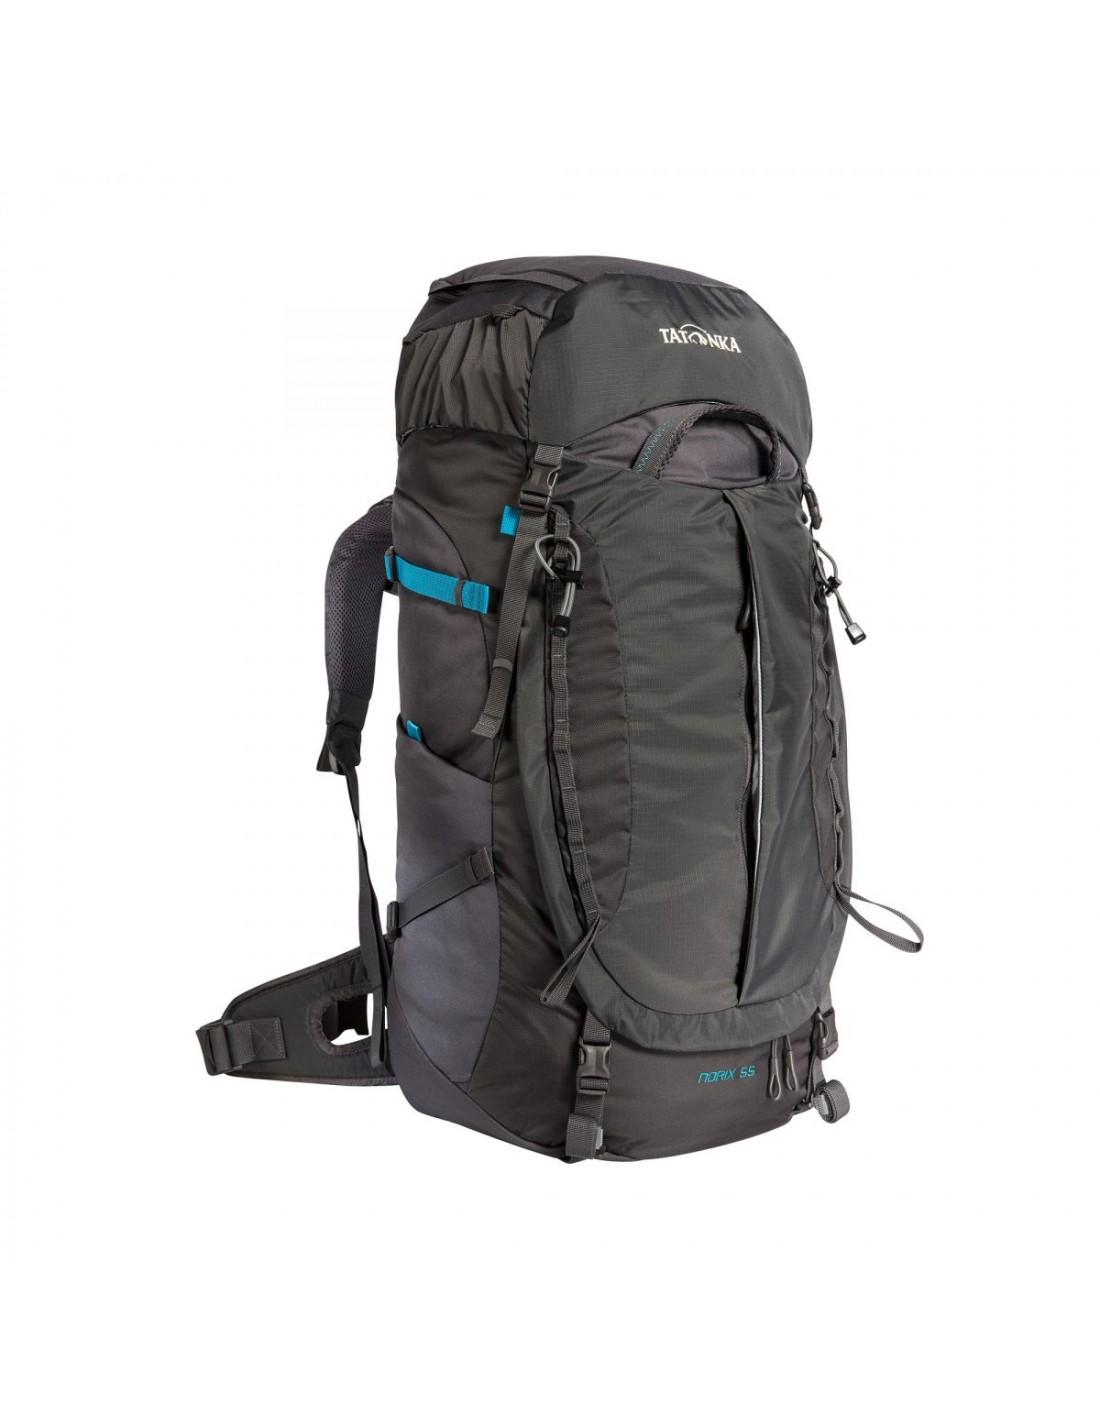 Tatonka Rucksack Norix 55, titan grey Rucksackart - Wandern & Trekking, Ruc günstig online kaufen